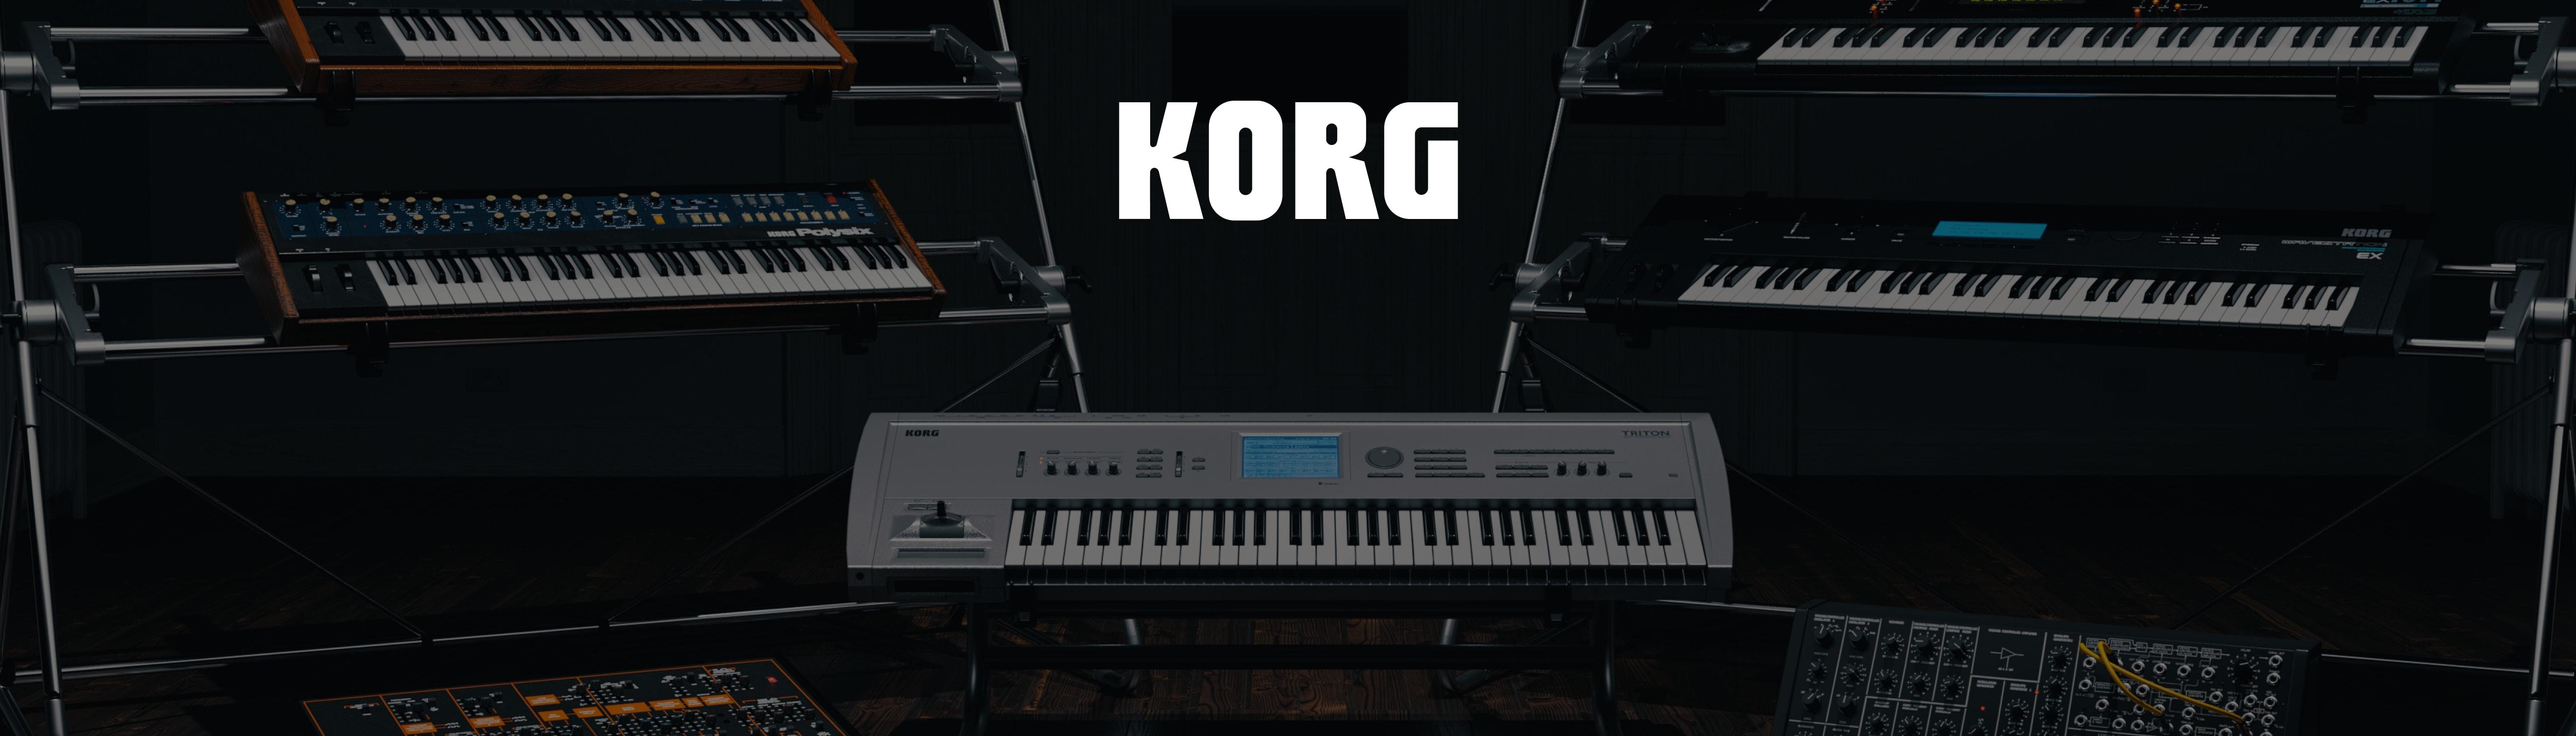 KORG Collection 2 header